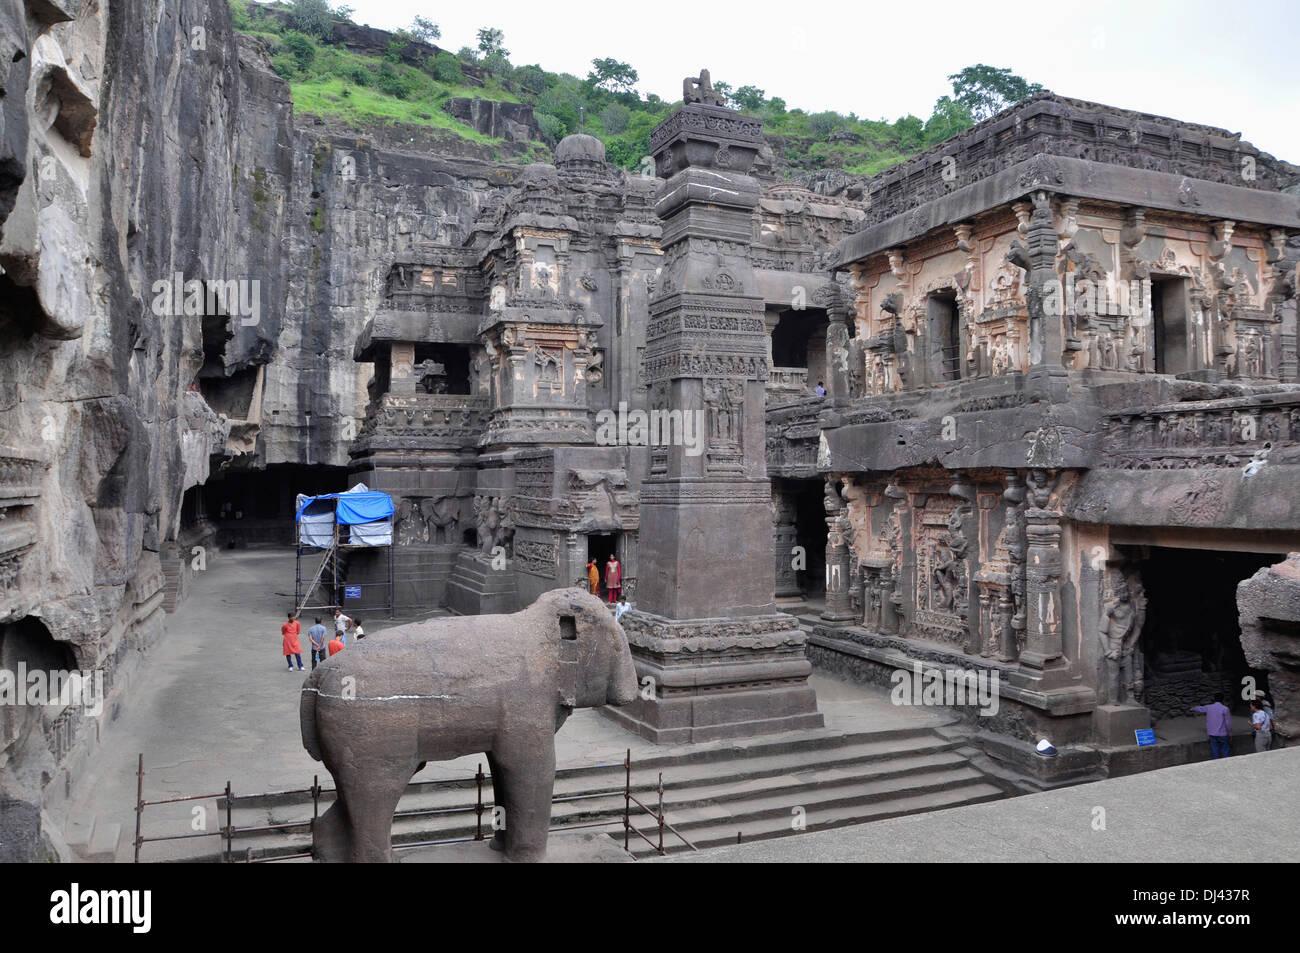 Höhle 16: Tempel-Hof und Sieg Säule Nord. Narasimha an der Südwand. Ellora Höhlen, Aurangabad, Maharashtra, Indien Stockfoto